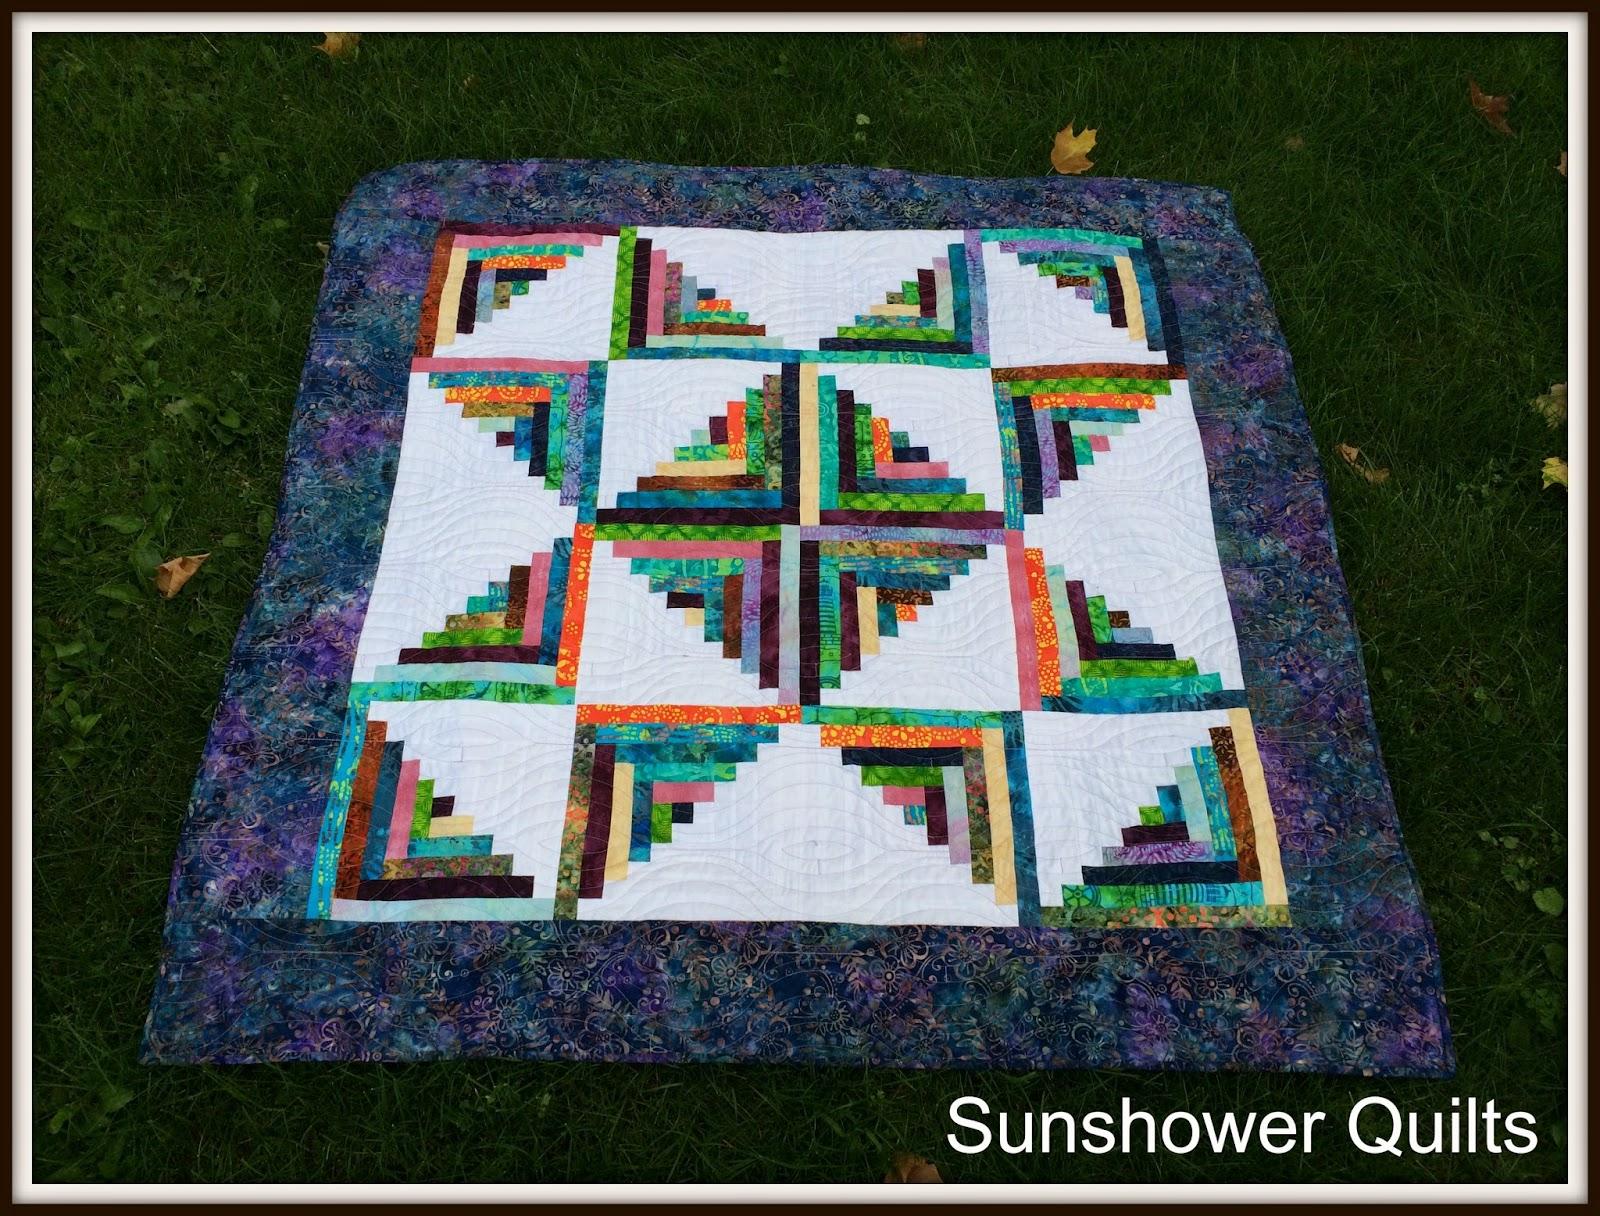 Sunshower Quilts Log Cabin on the Go! # Sunshower Goes_064641